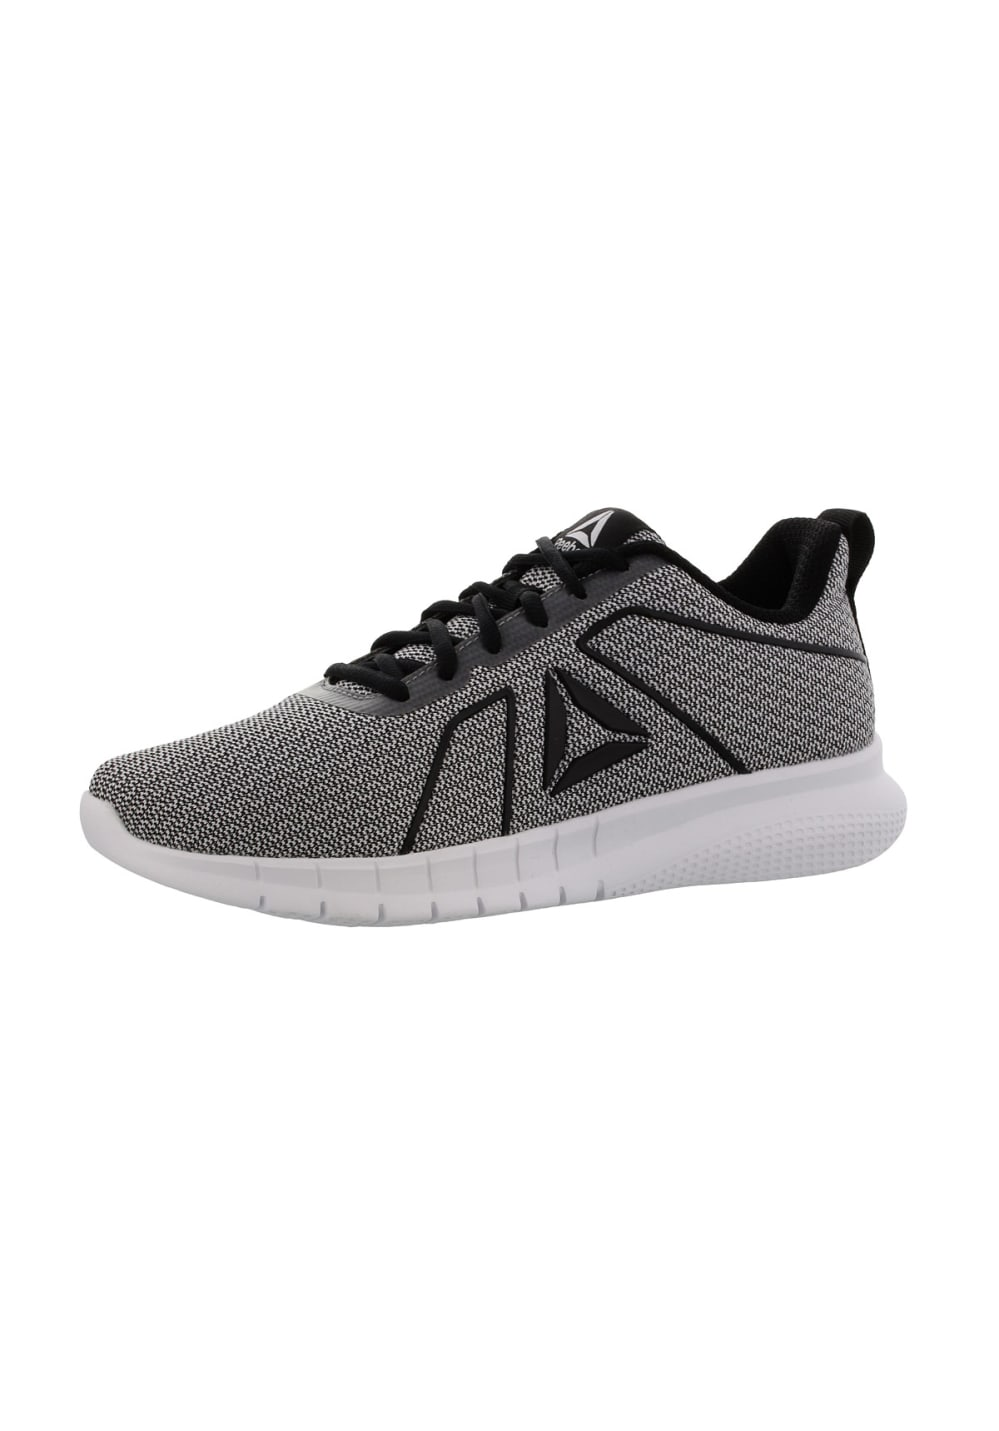 Reebok Instalite Pro Hthr Chaussures running pour Femme Gris